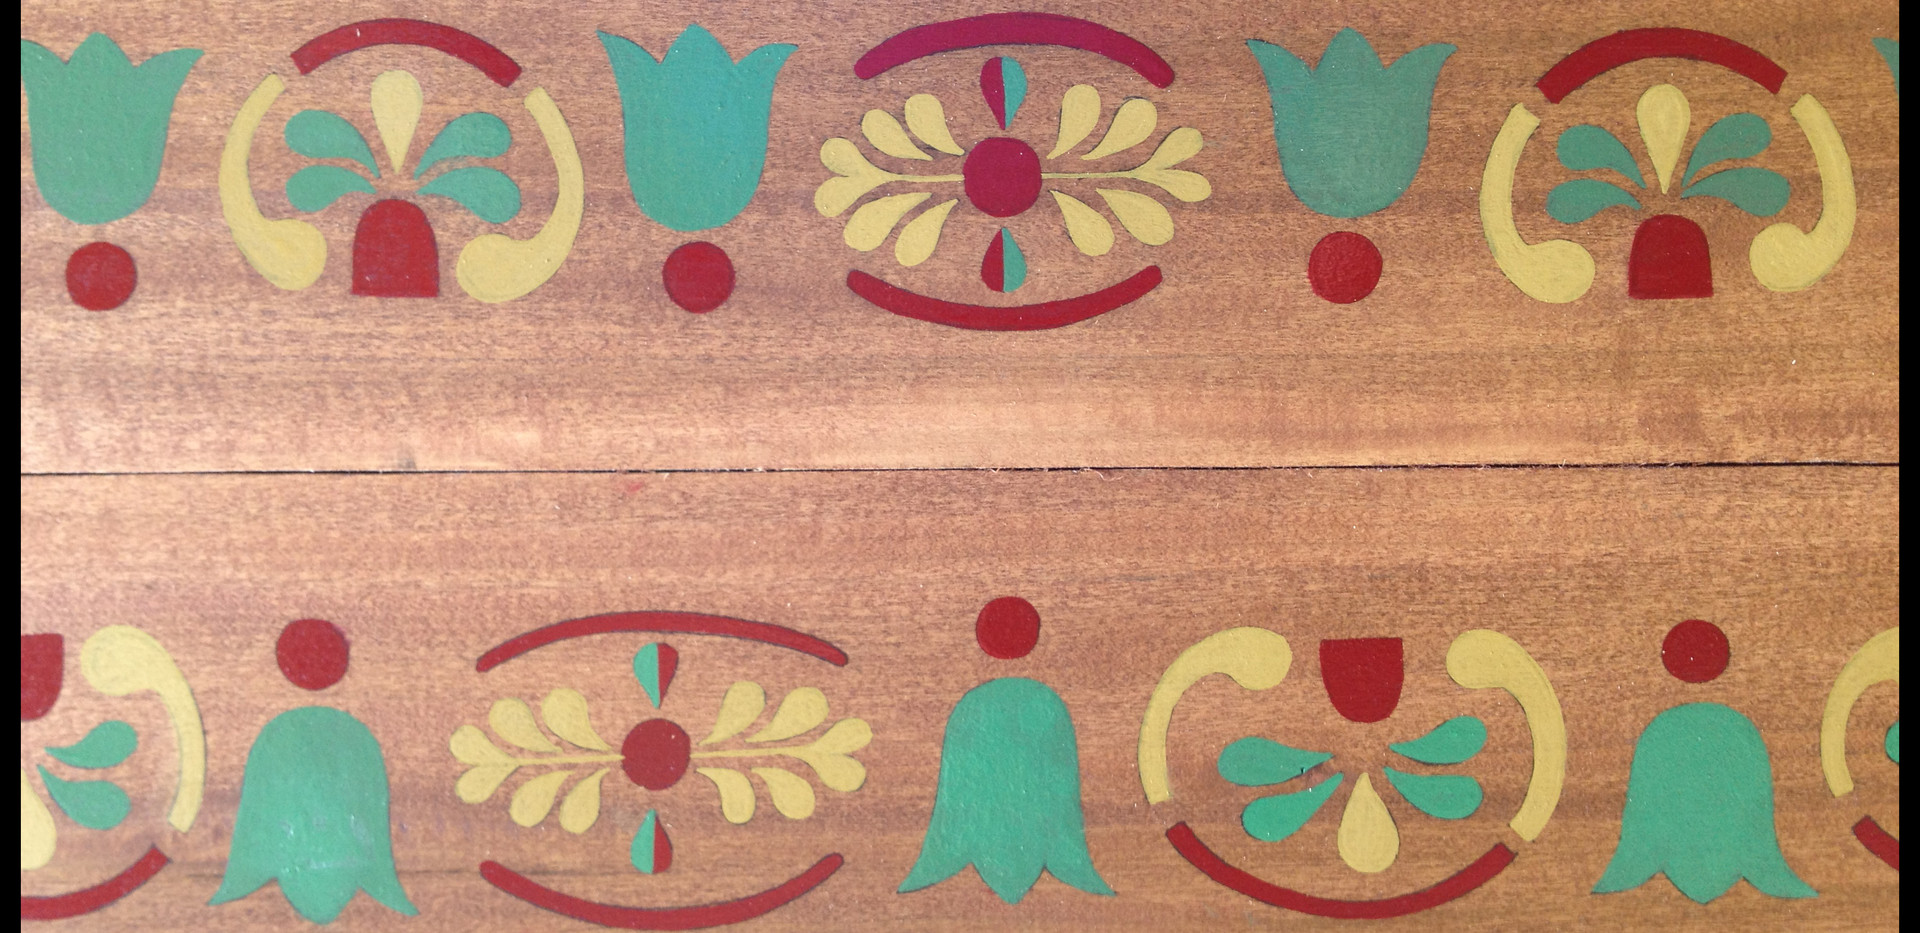 Columbia-painted-wood-detail-viciousarts